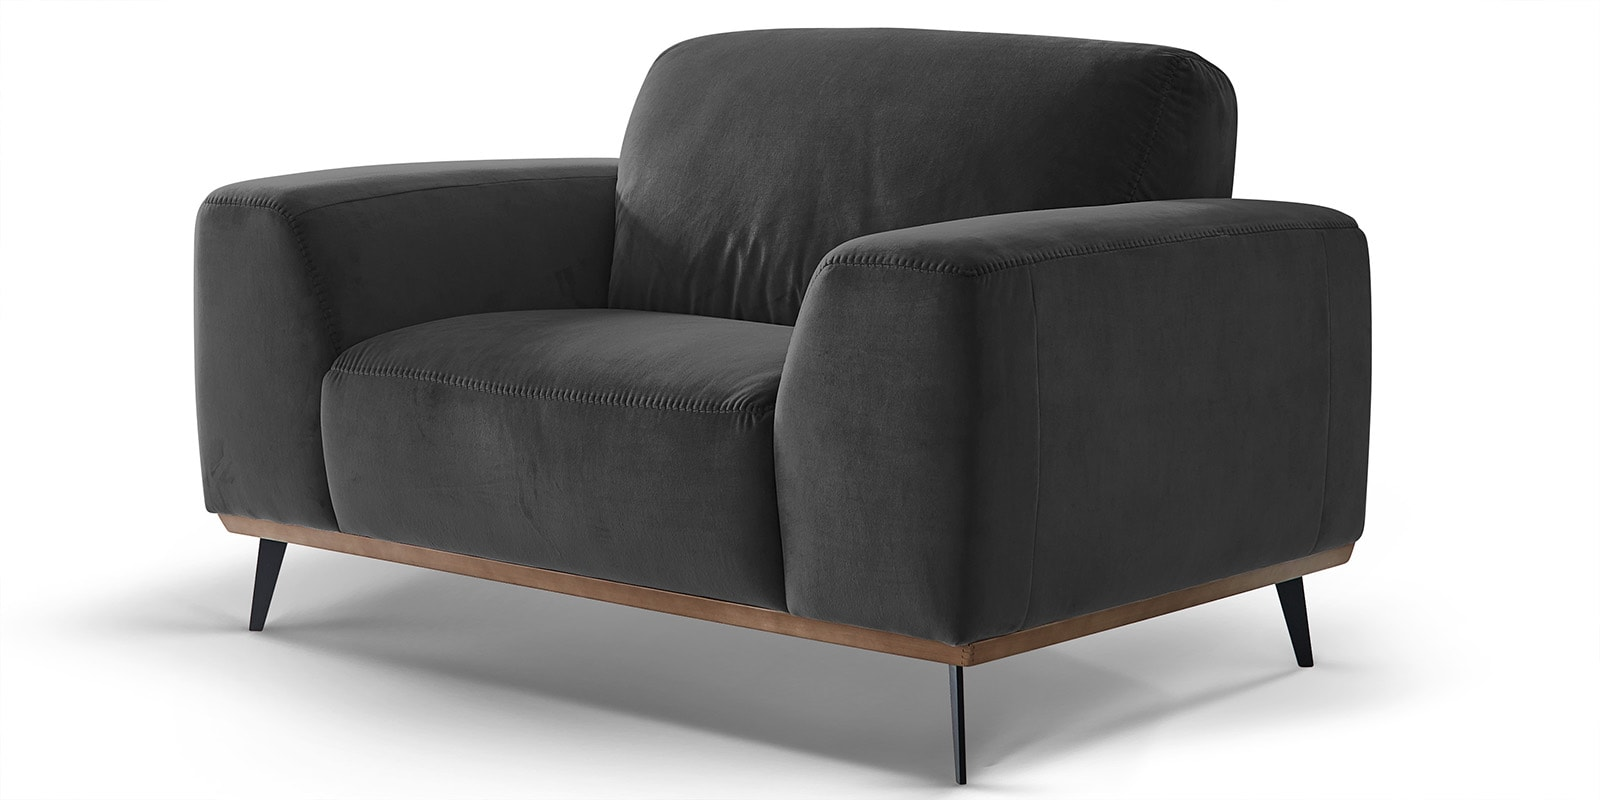 Moebella24 - 1-Sitzer - Sofa - Sessel - Barcelona - Samt - Anthrazit - Skandinavisches - Design - Punto - cavallo - Nähte - Detailaufnahme